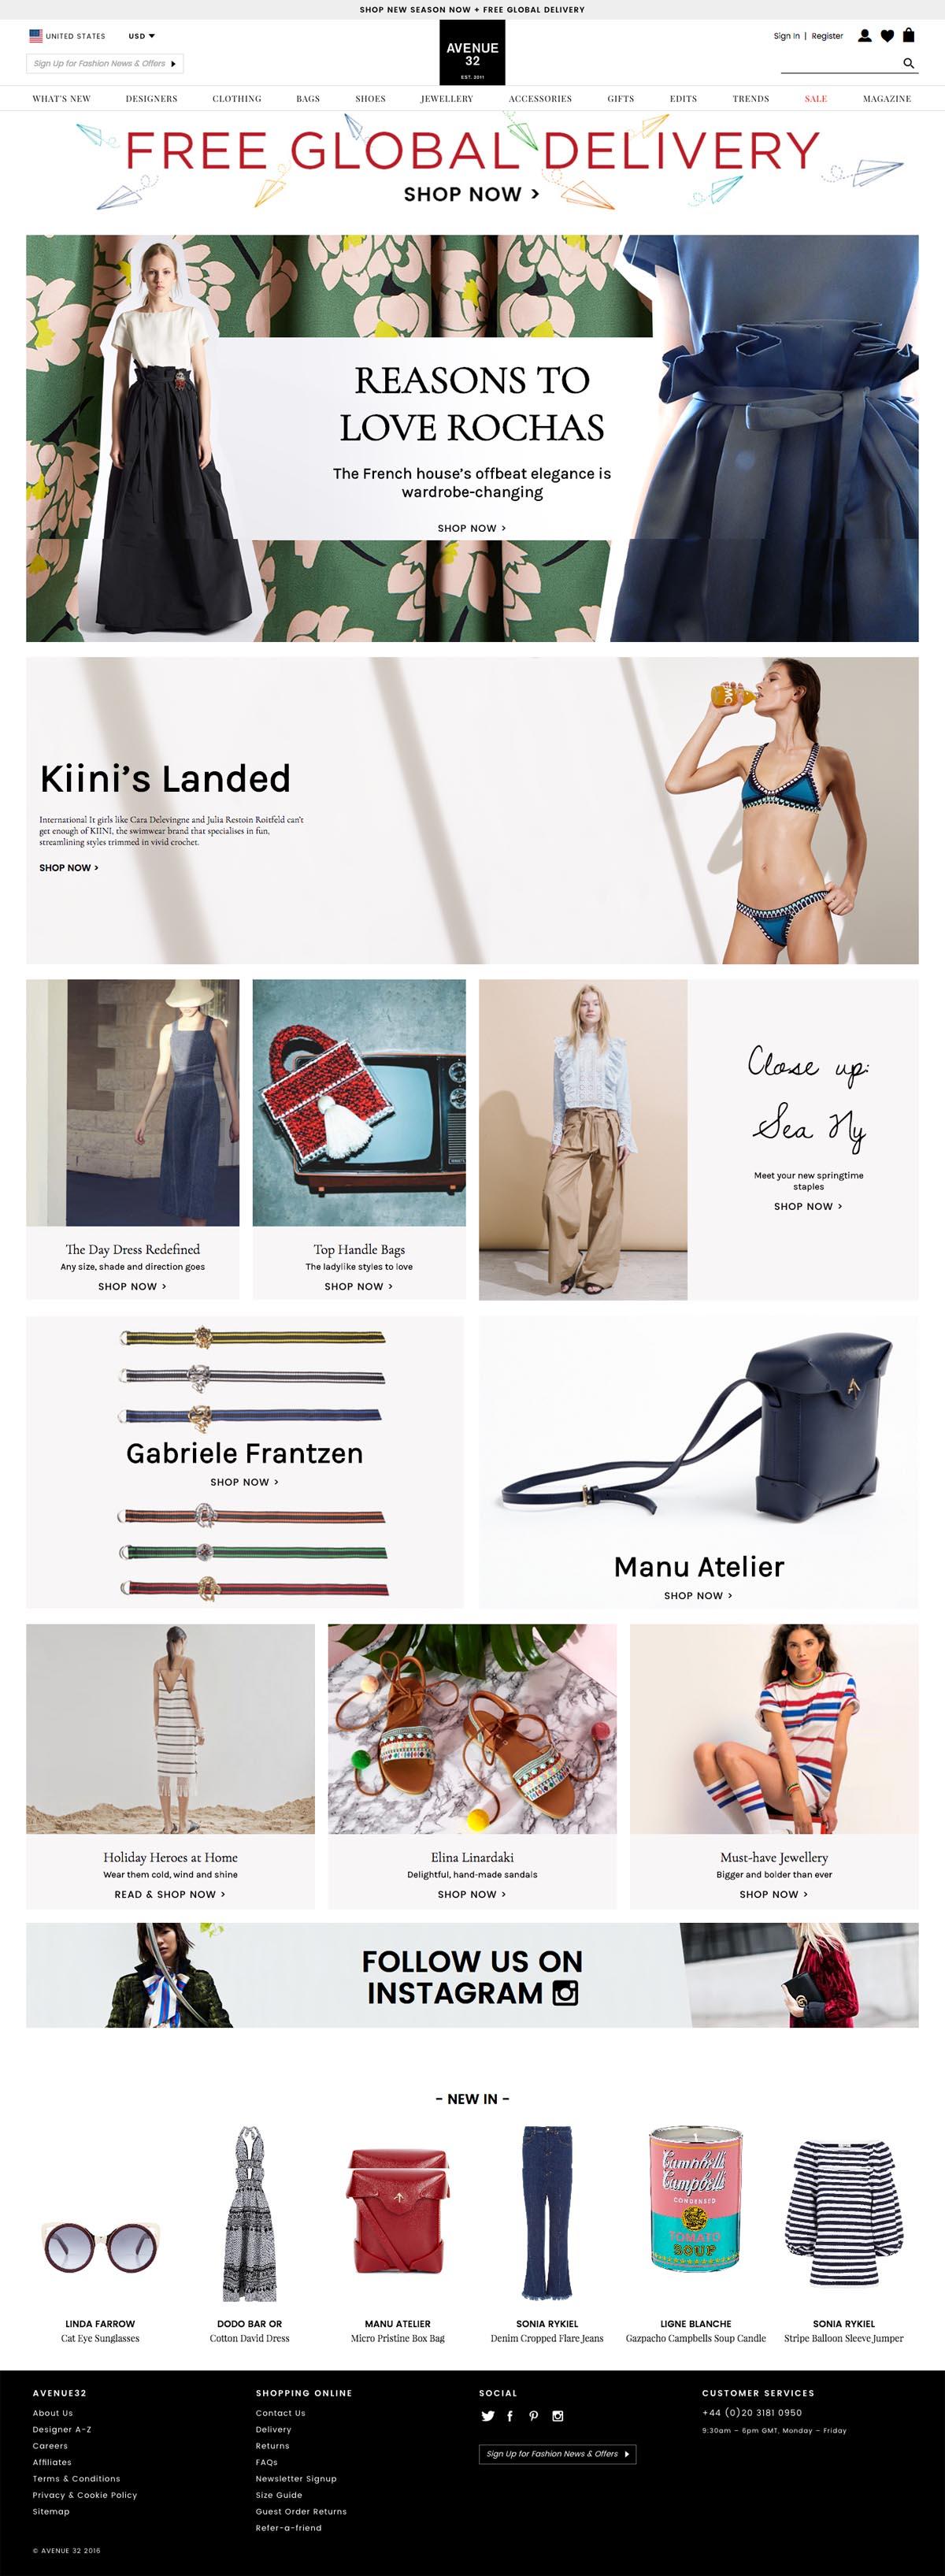 eCommerce website: Avenue 32